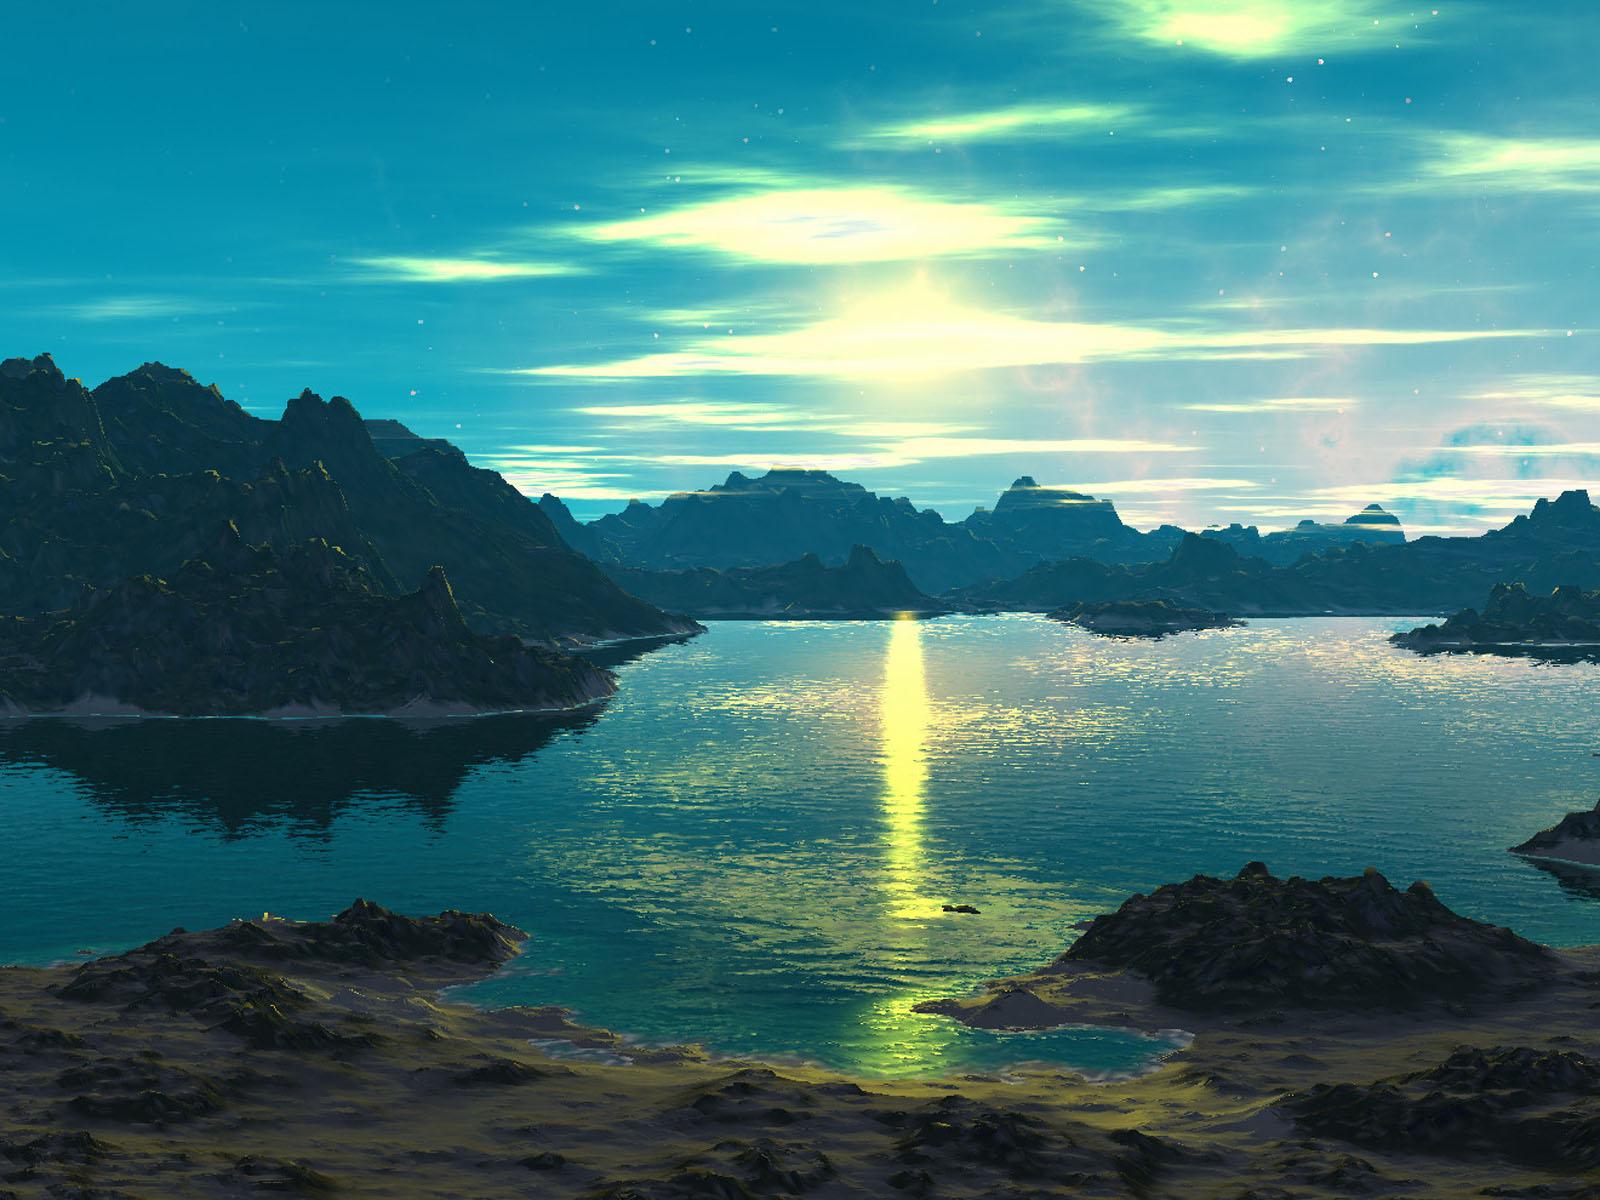 Wallpapers: Wallpapers: Alien Sunset Wallpapers